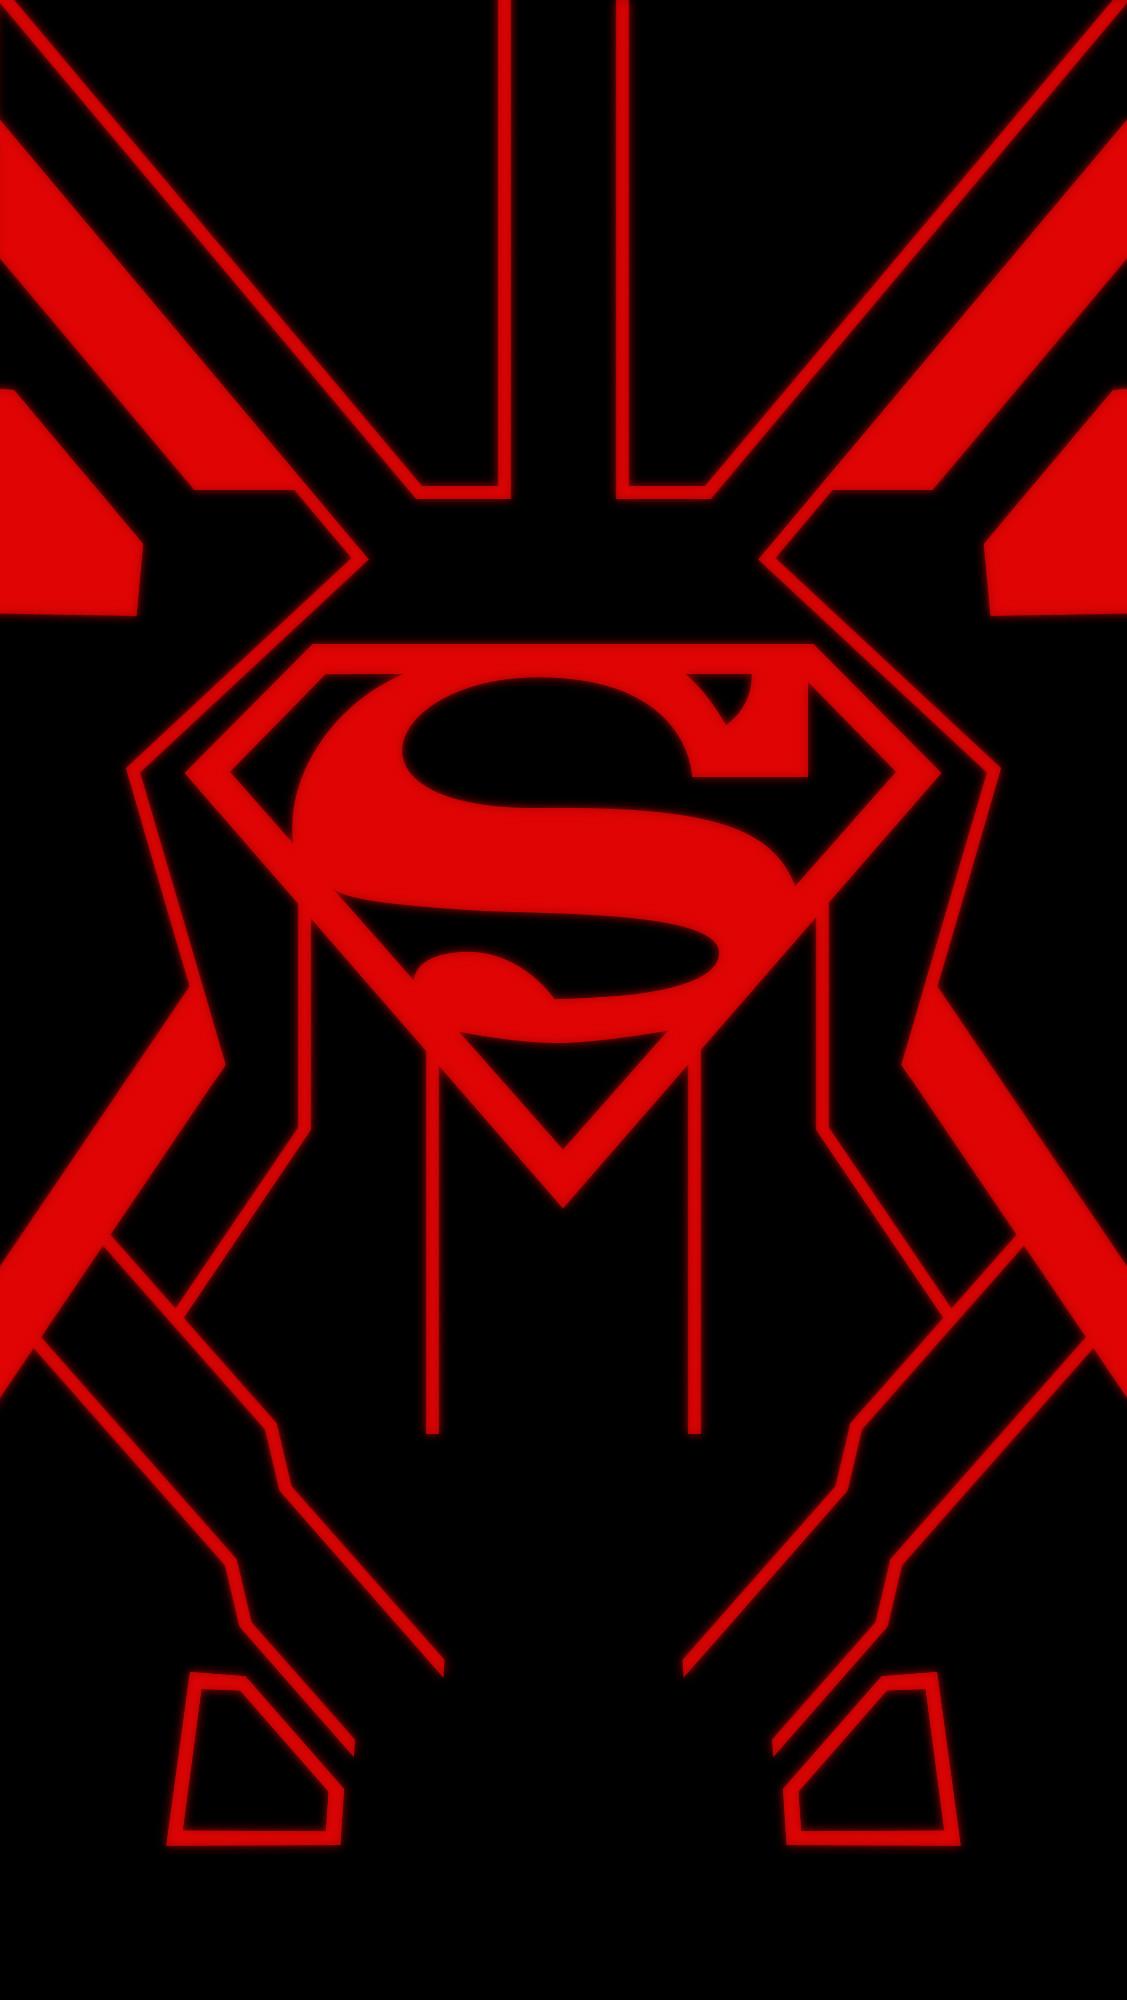 Superman Logo iPhone Wallpaper HD (65+ images)